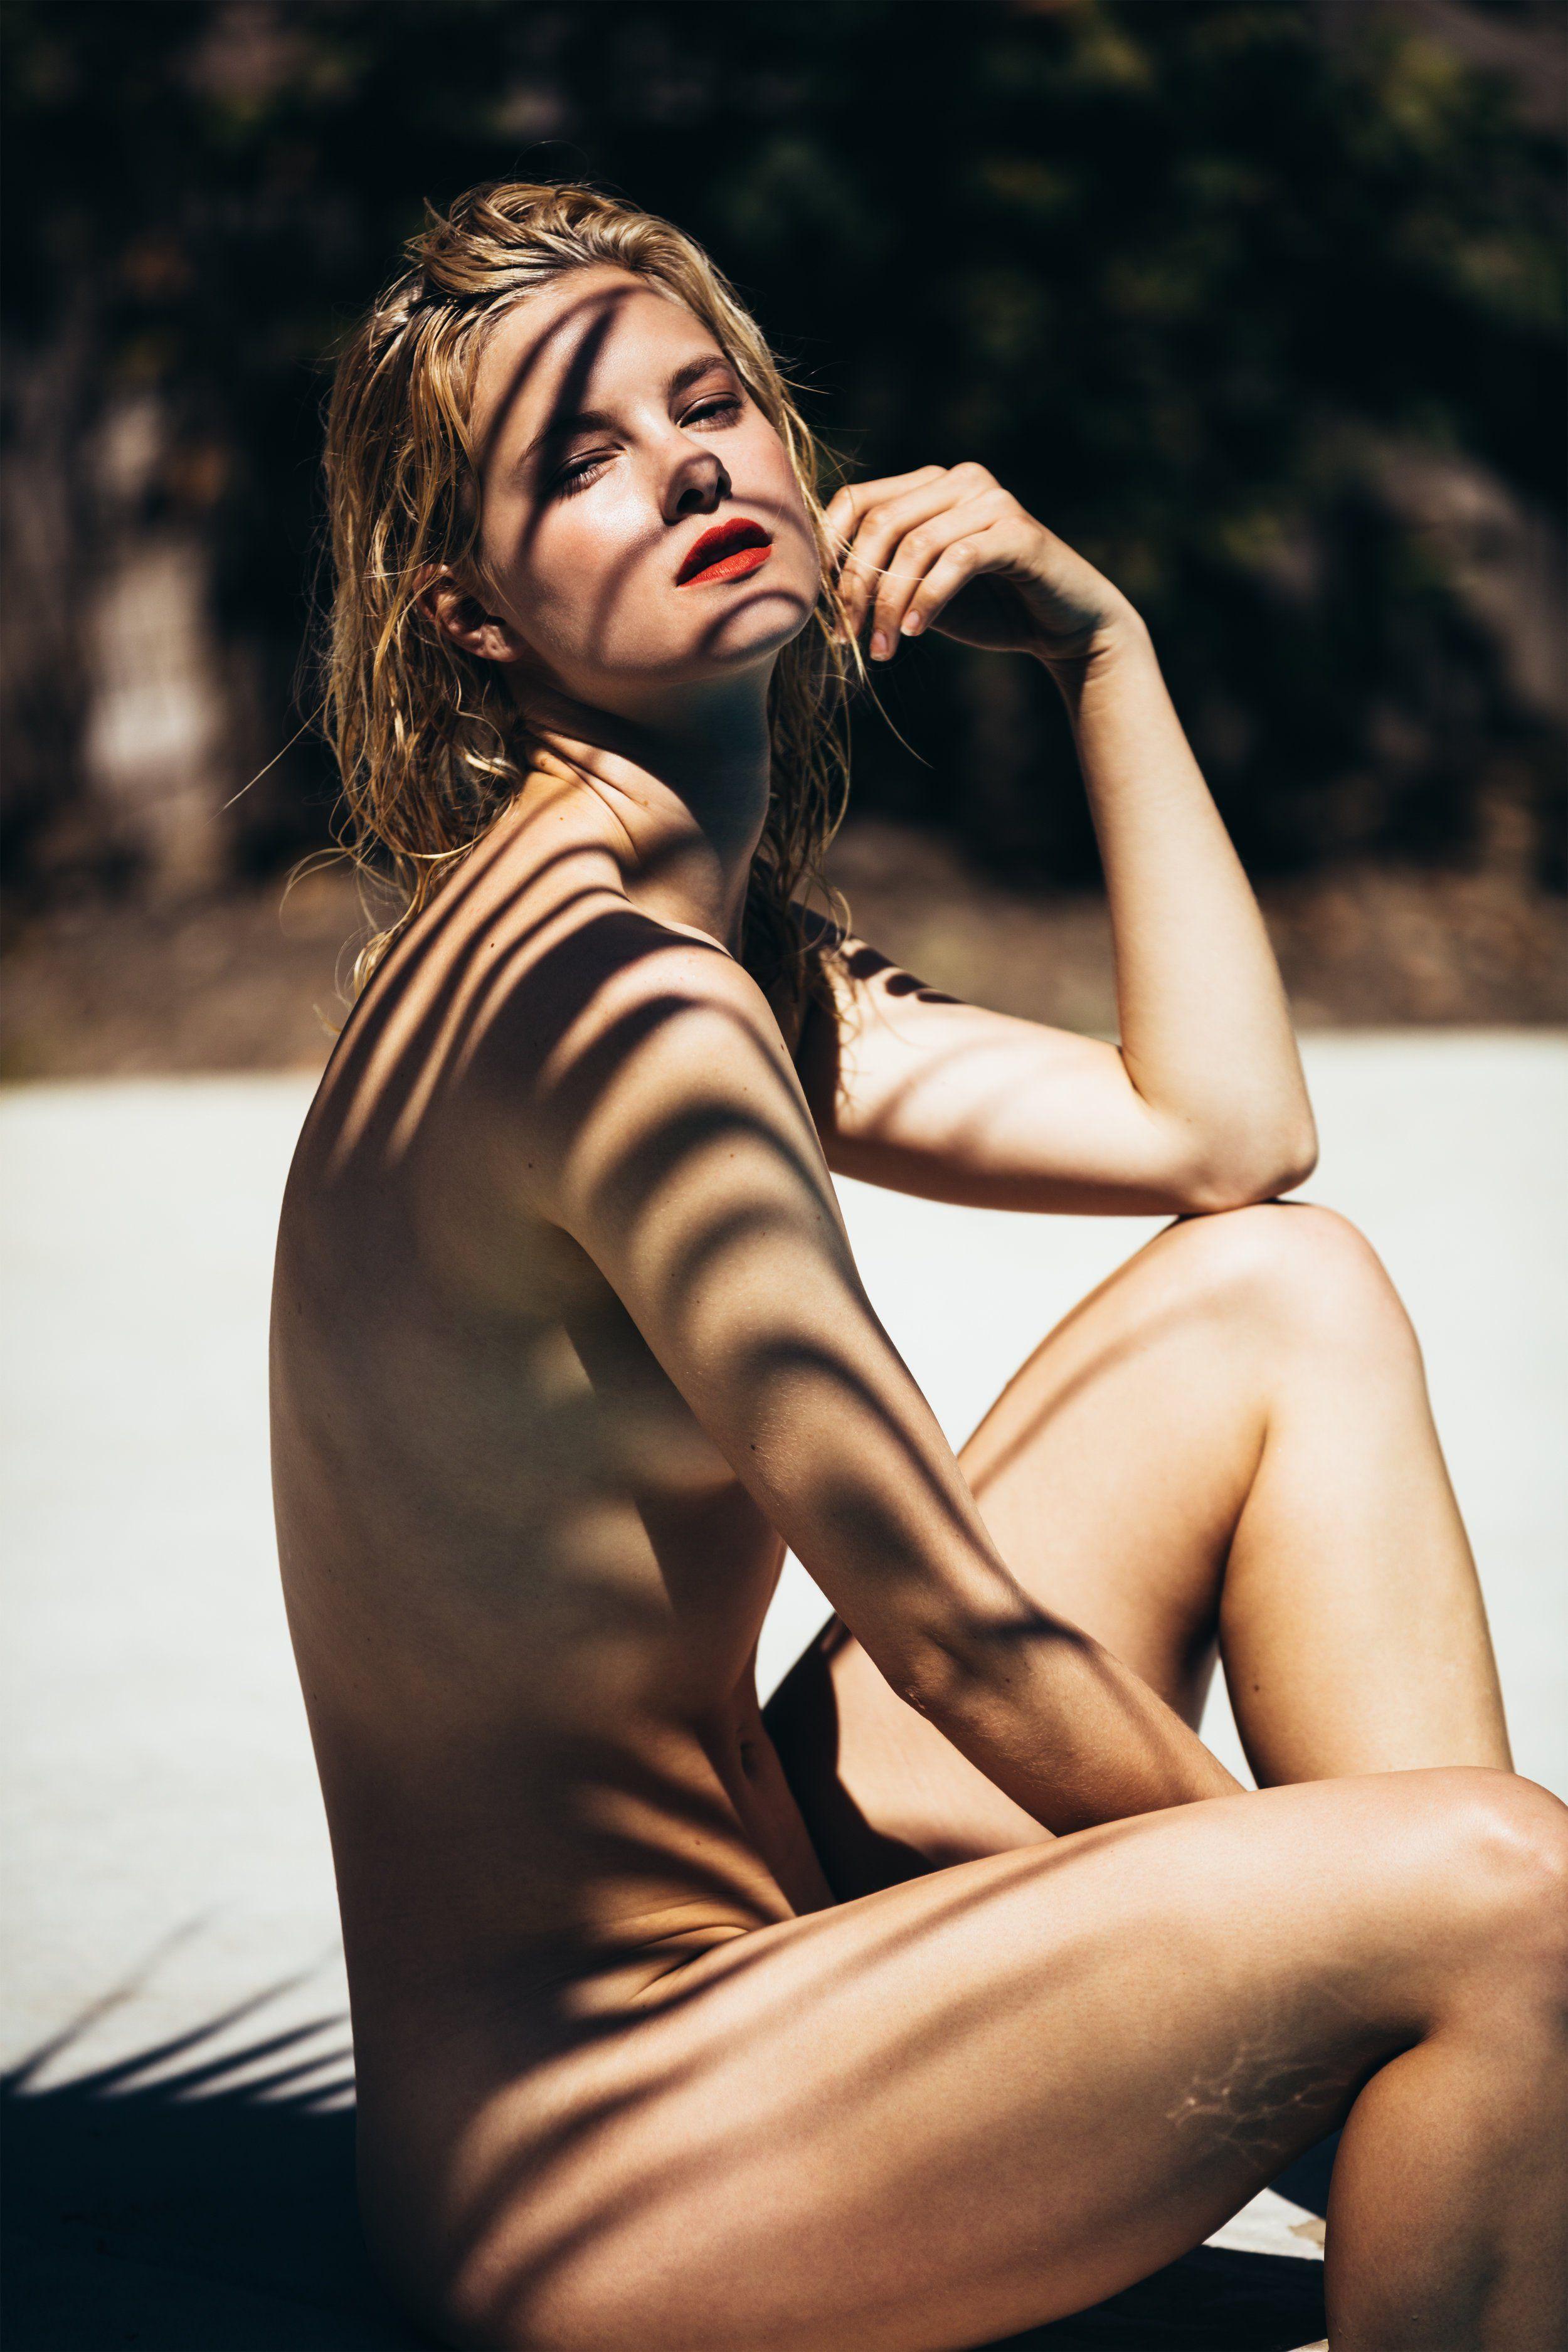 Hannah holman by aaron feaver hq photo shoot